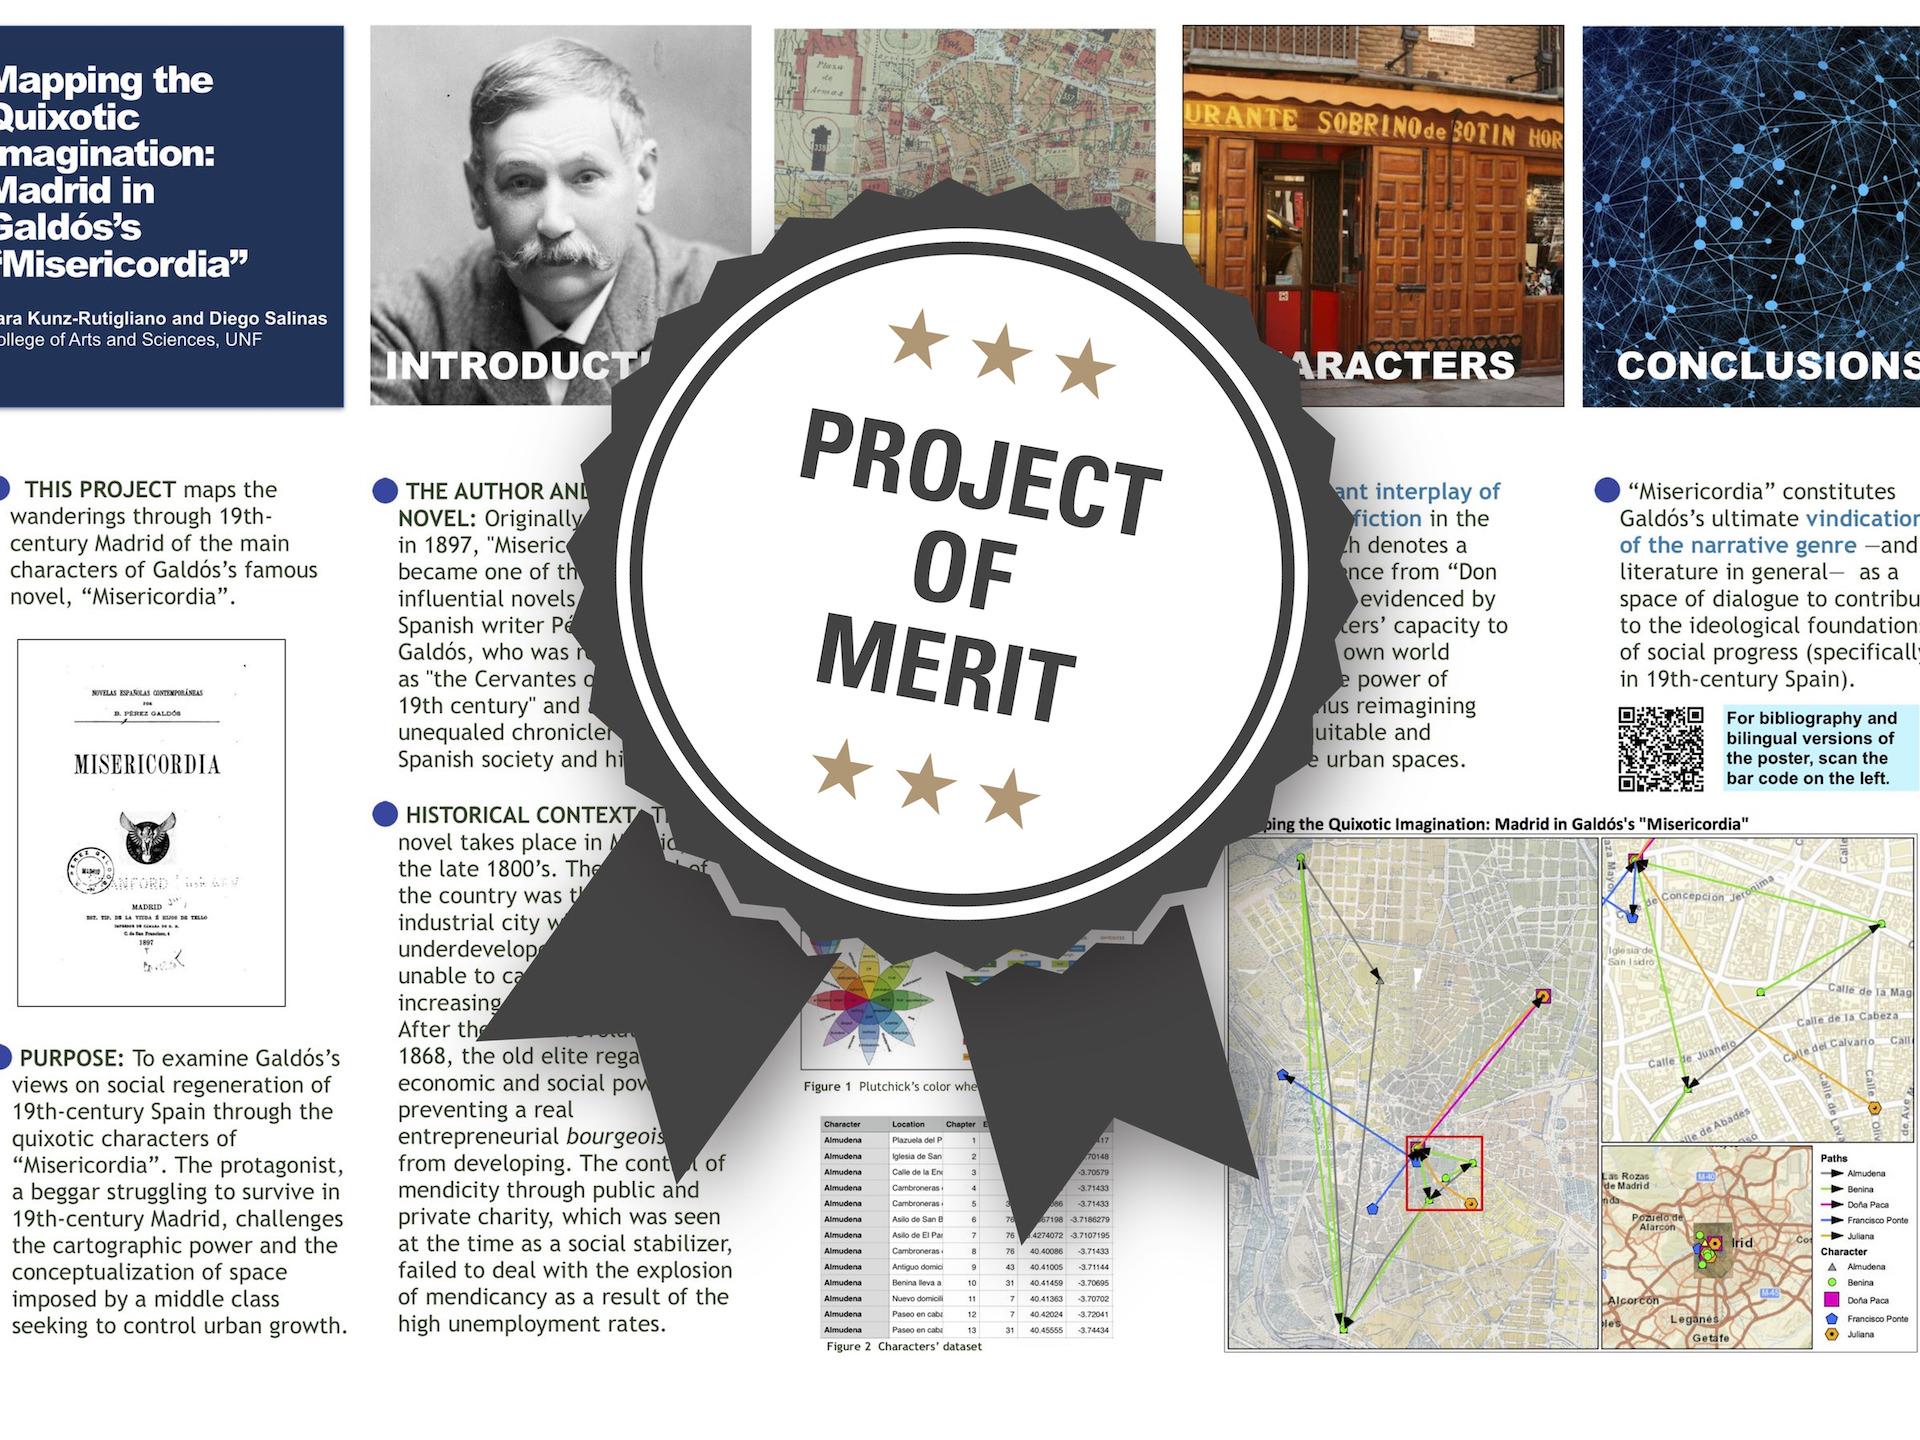 Mapping the Quixotic Imagination: Madrid in Galdos' Misericordia Project of Merit poster